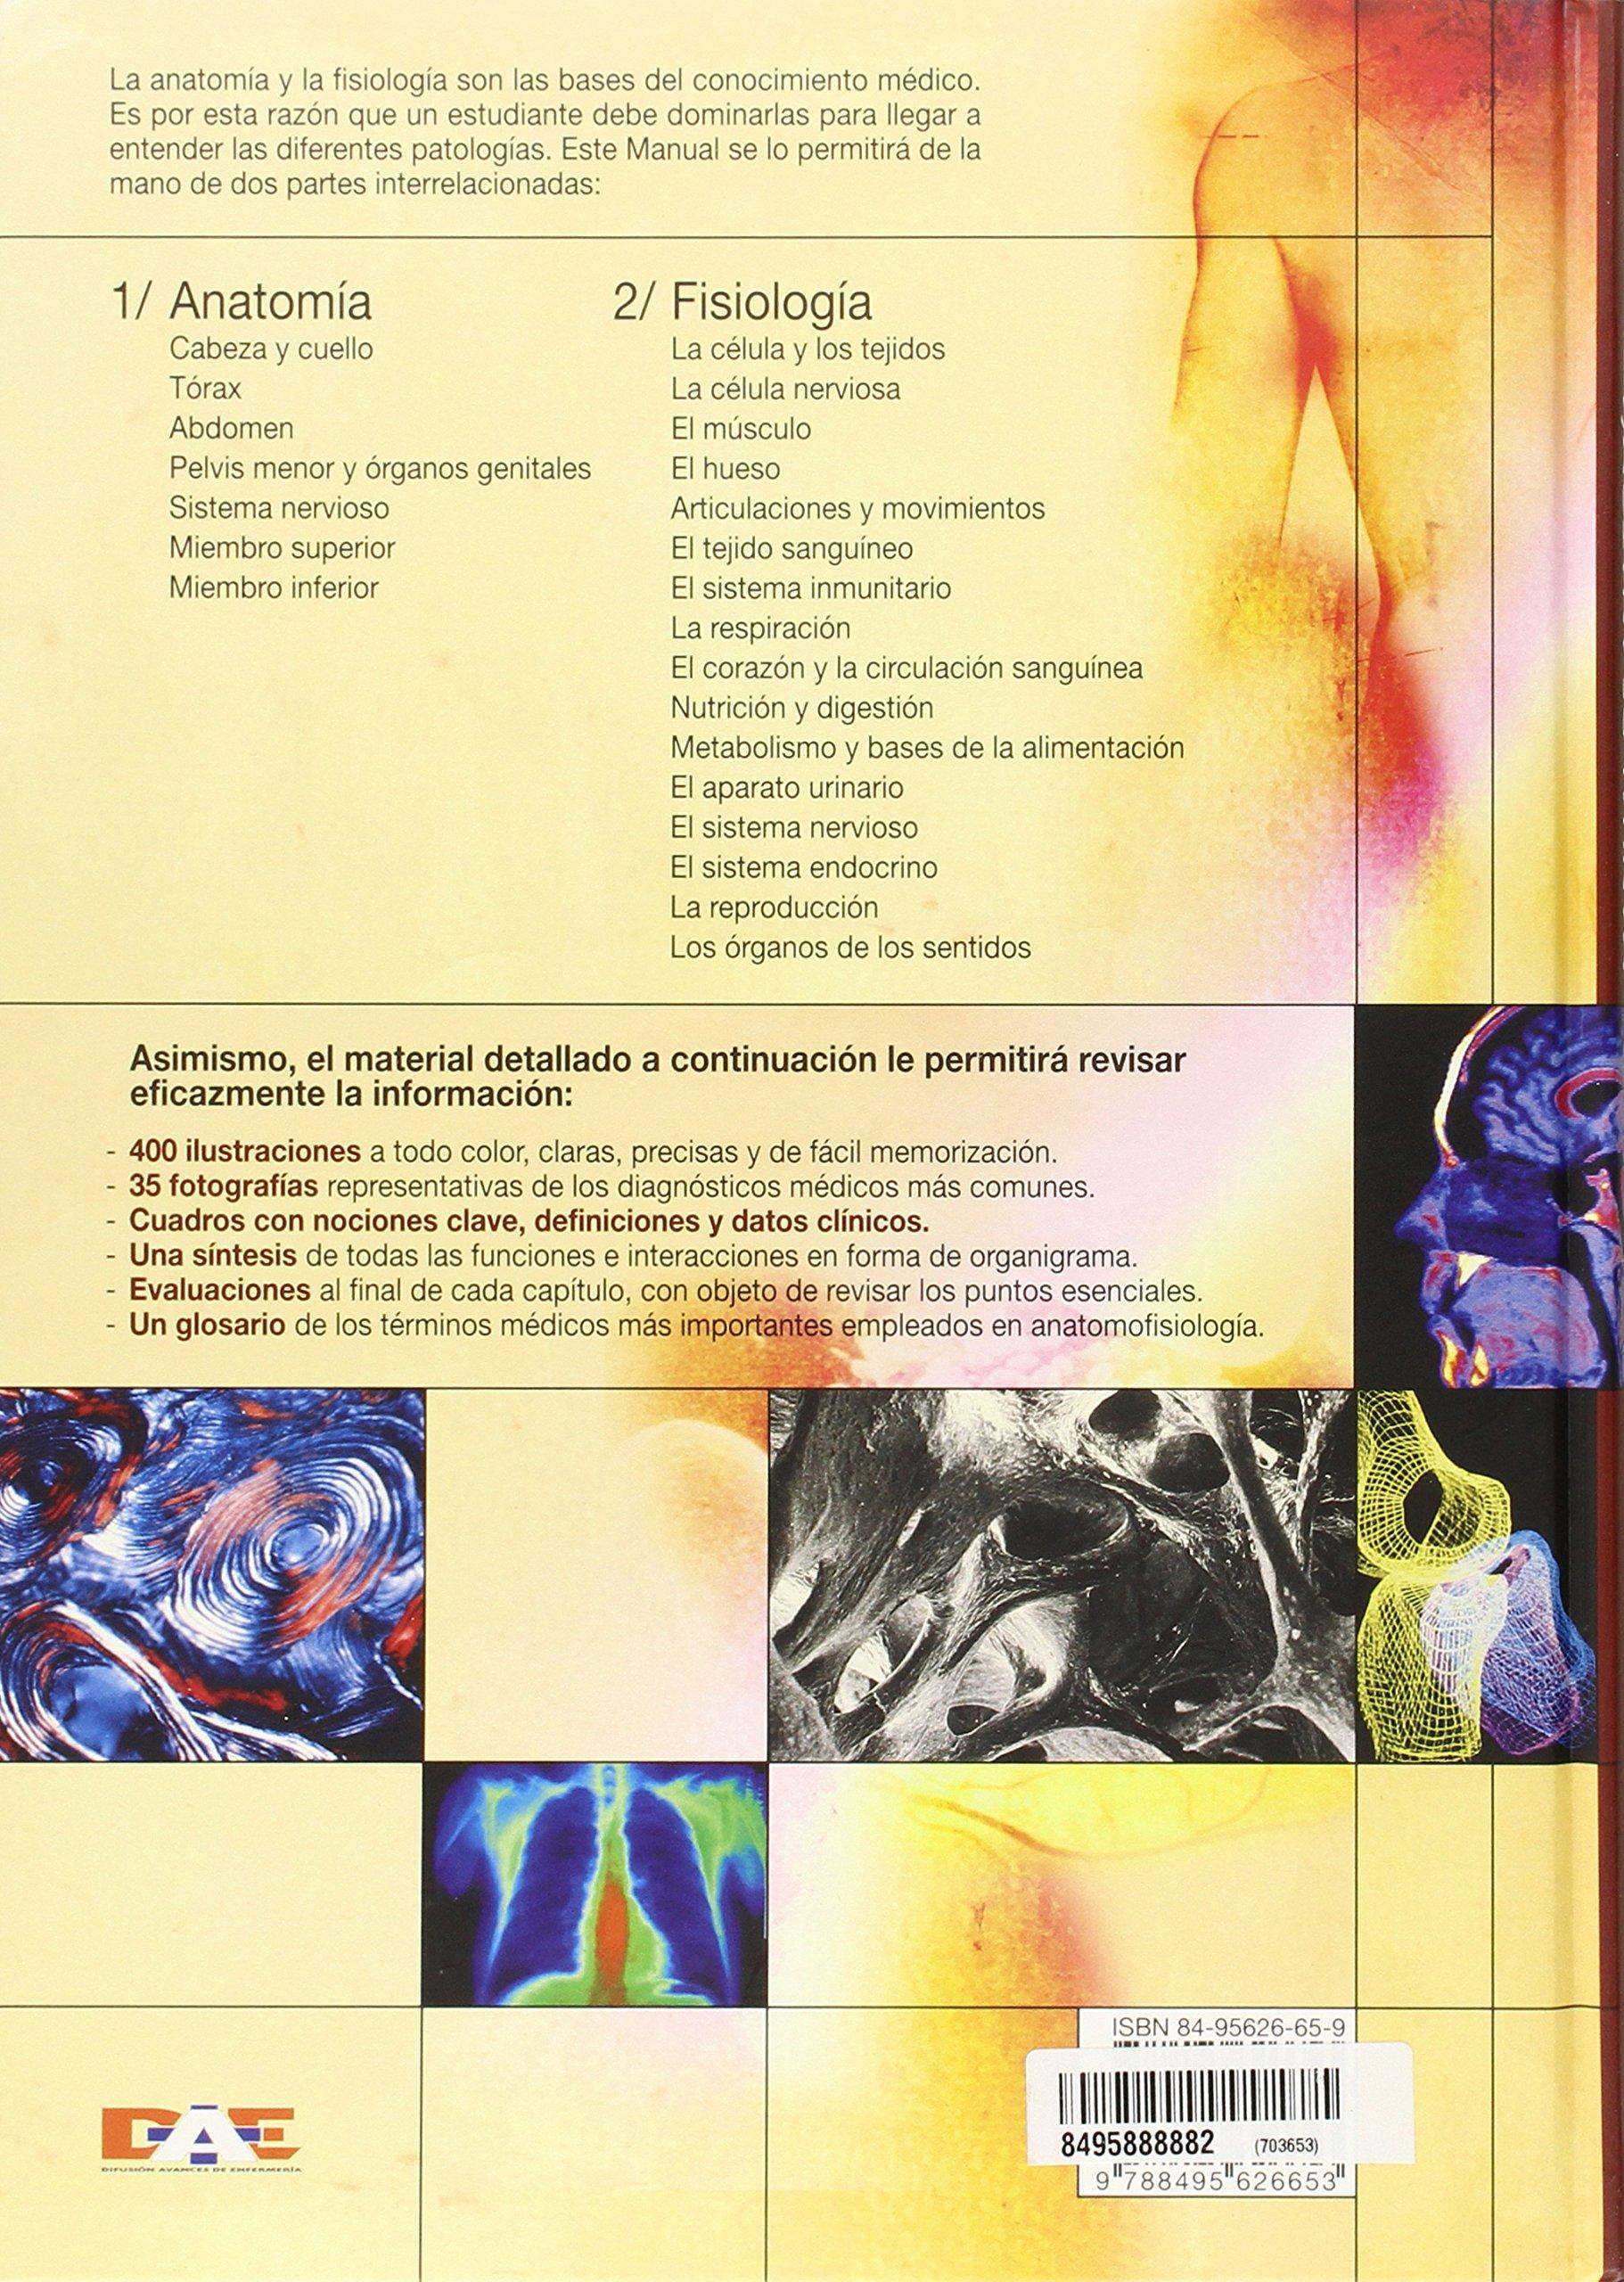 pack Anatomia Y Fisiologia Humana/Manual Anatomia Y Fisiologia ...